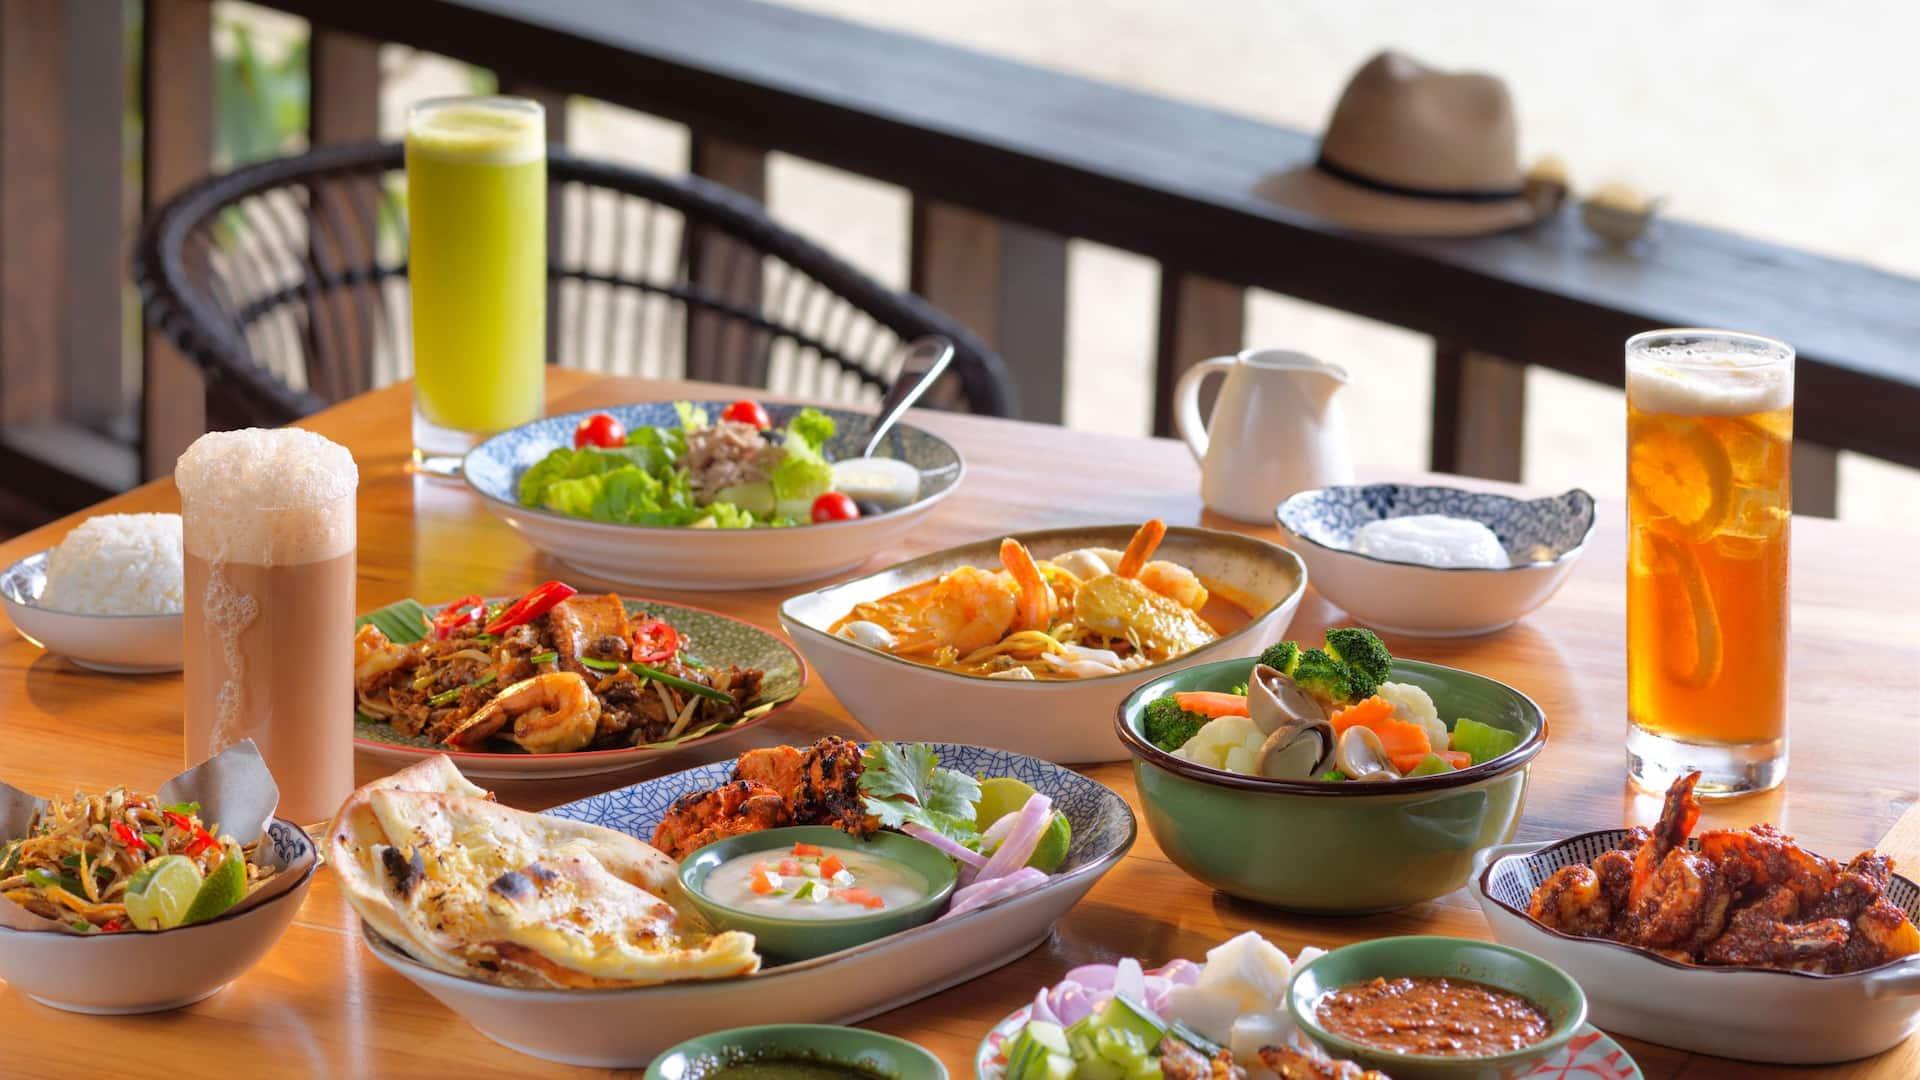 Local Dish, Best Kampung Food Restaurant in Hyatt Regency Resort, Kuantan Malaysia